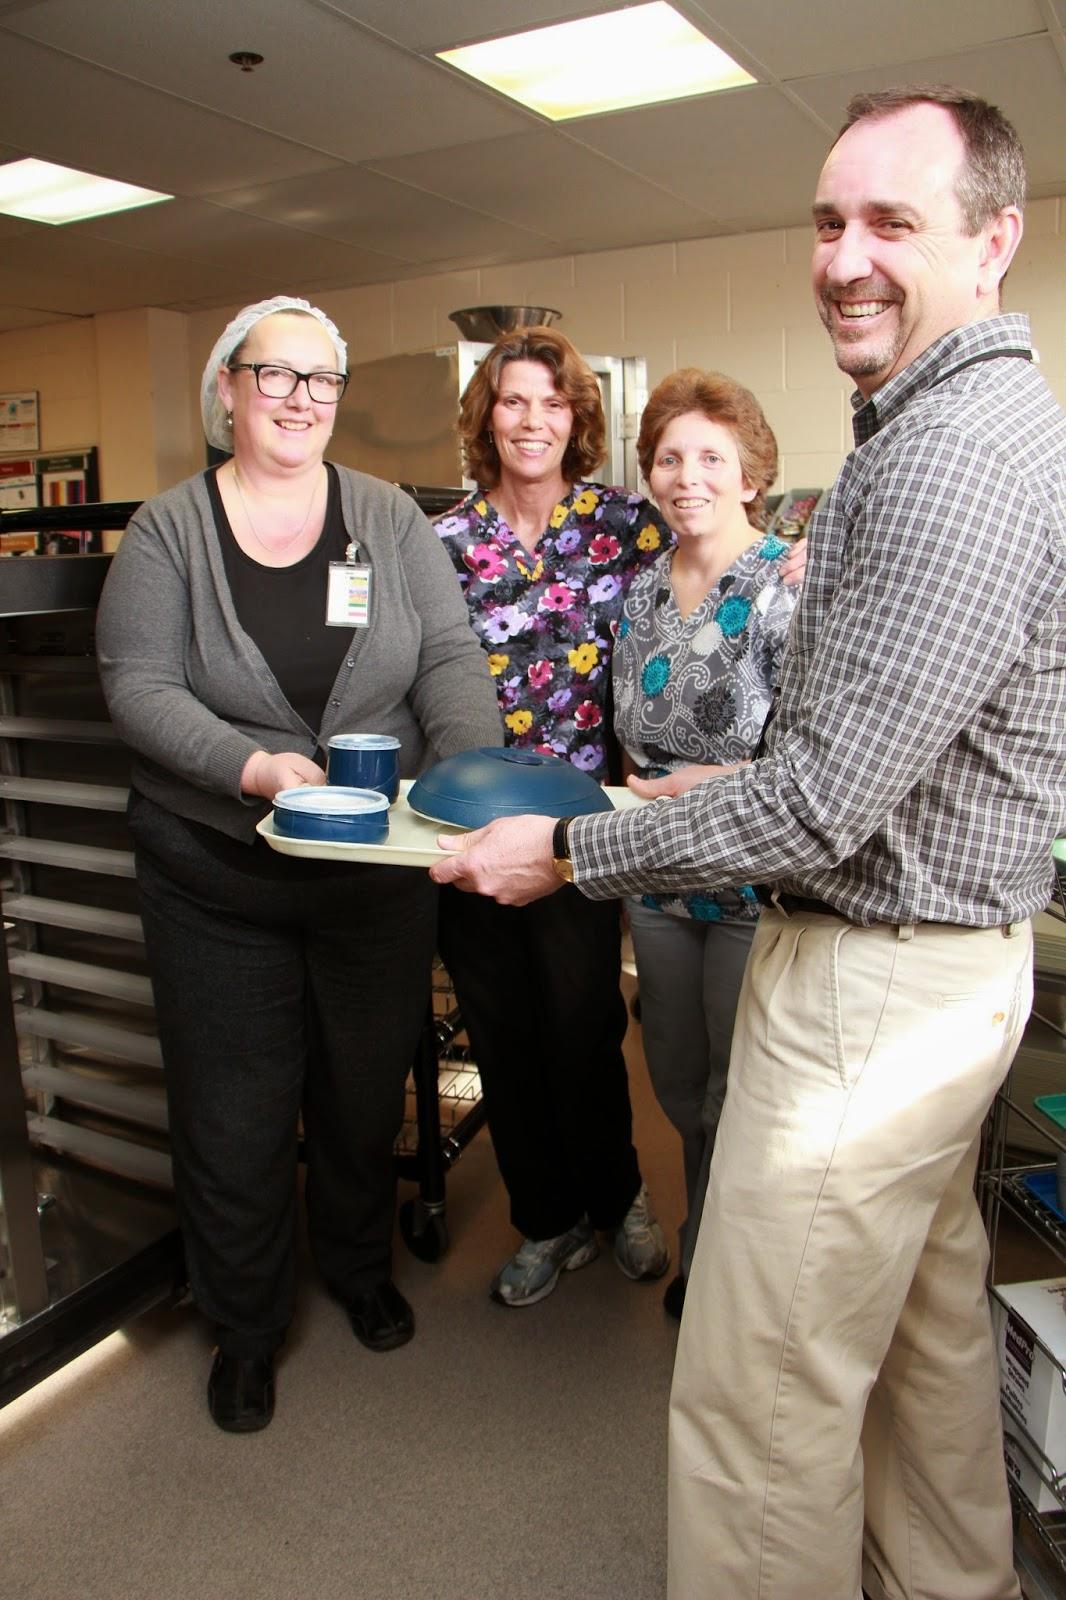 Hospital staff celebrate the food service improvements at South Muskoka Memorial Hospital Site